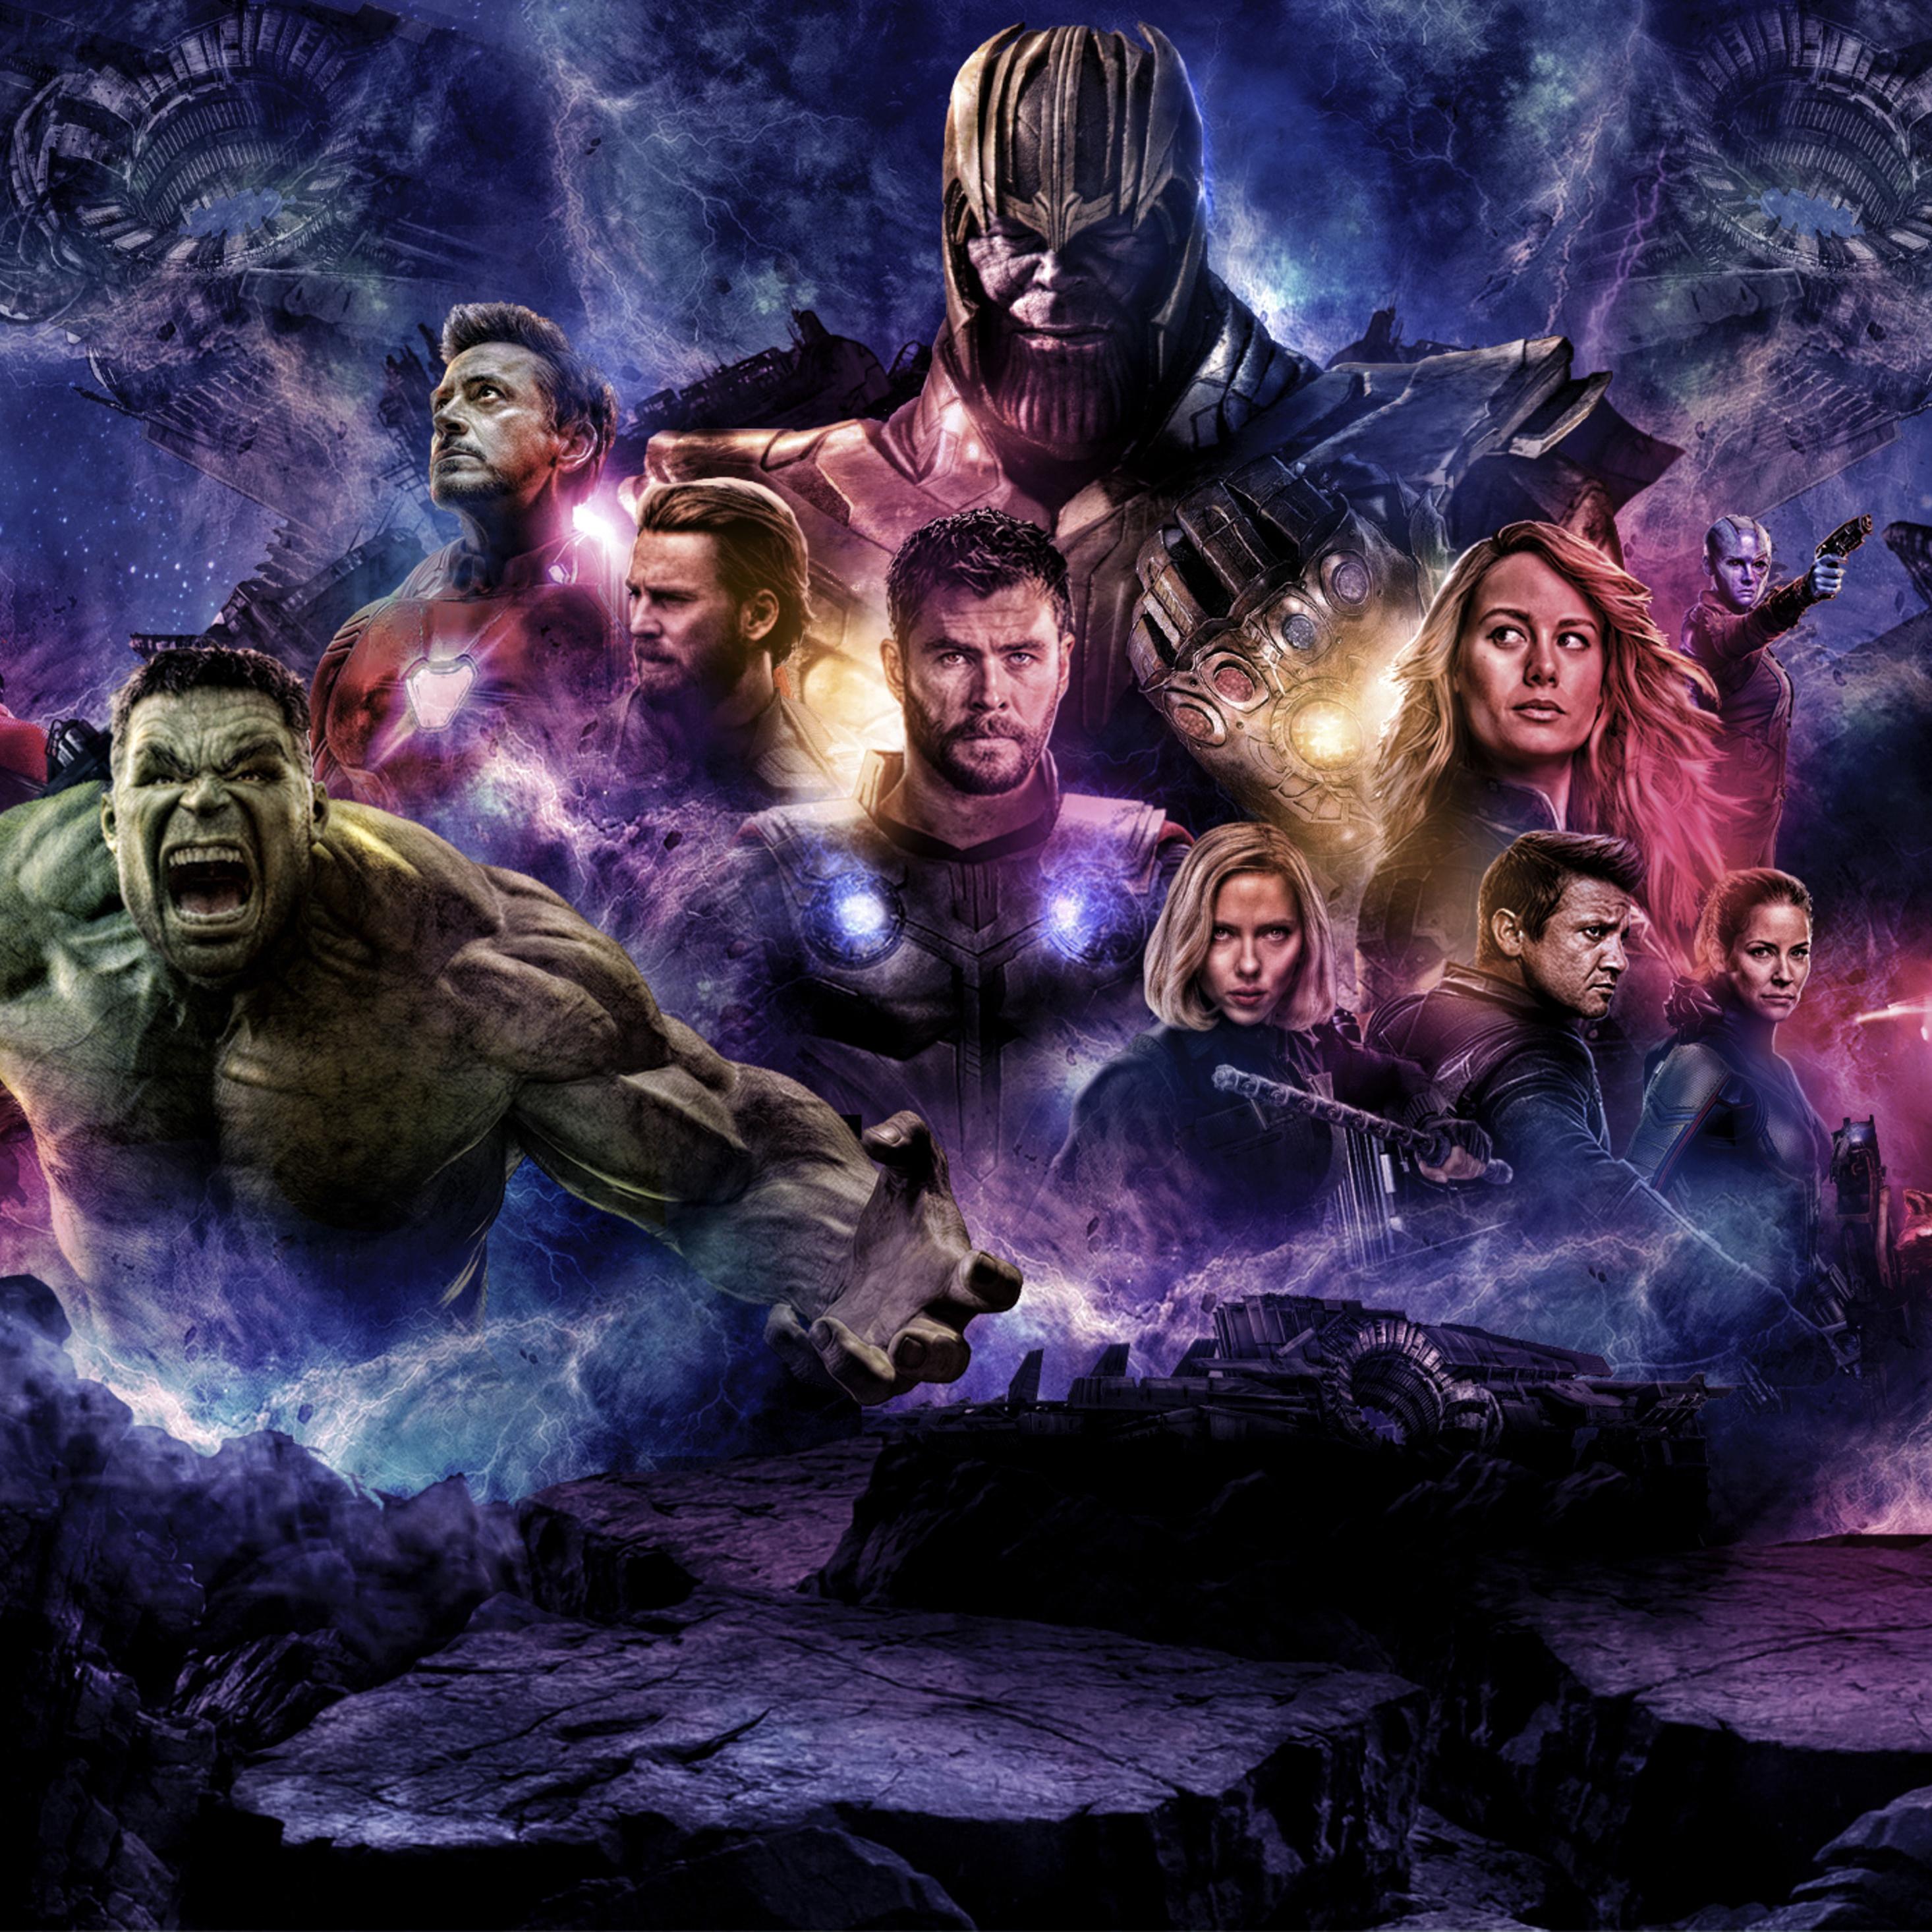 2932x2932 Avengers 4 2019 Movie Poster Ipad Pro Retina